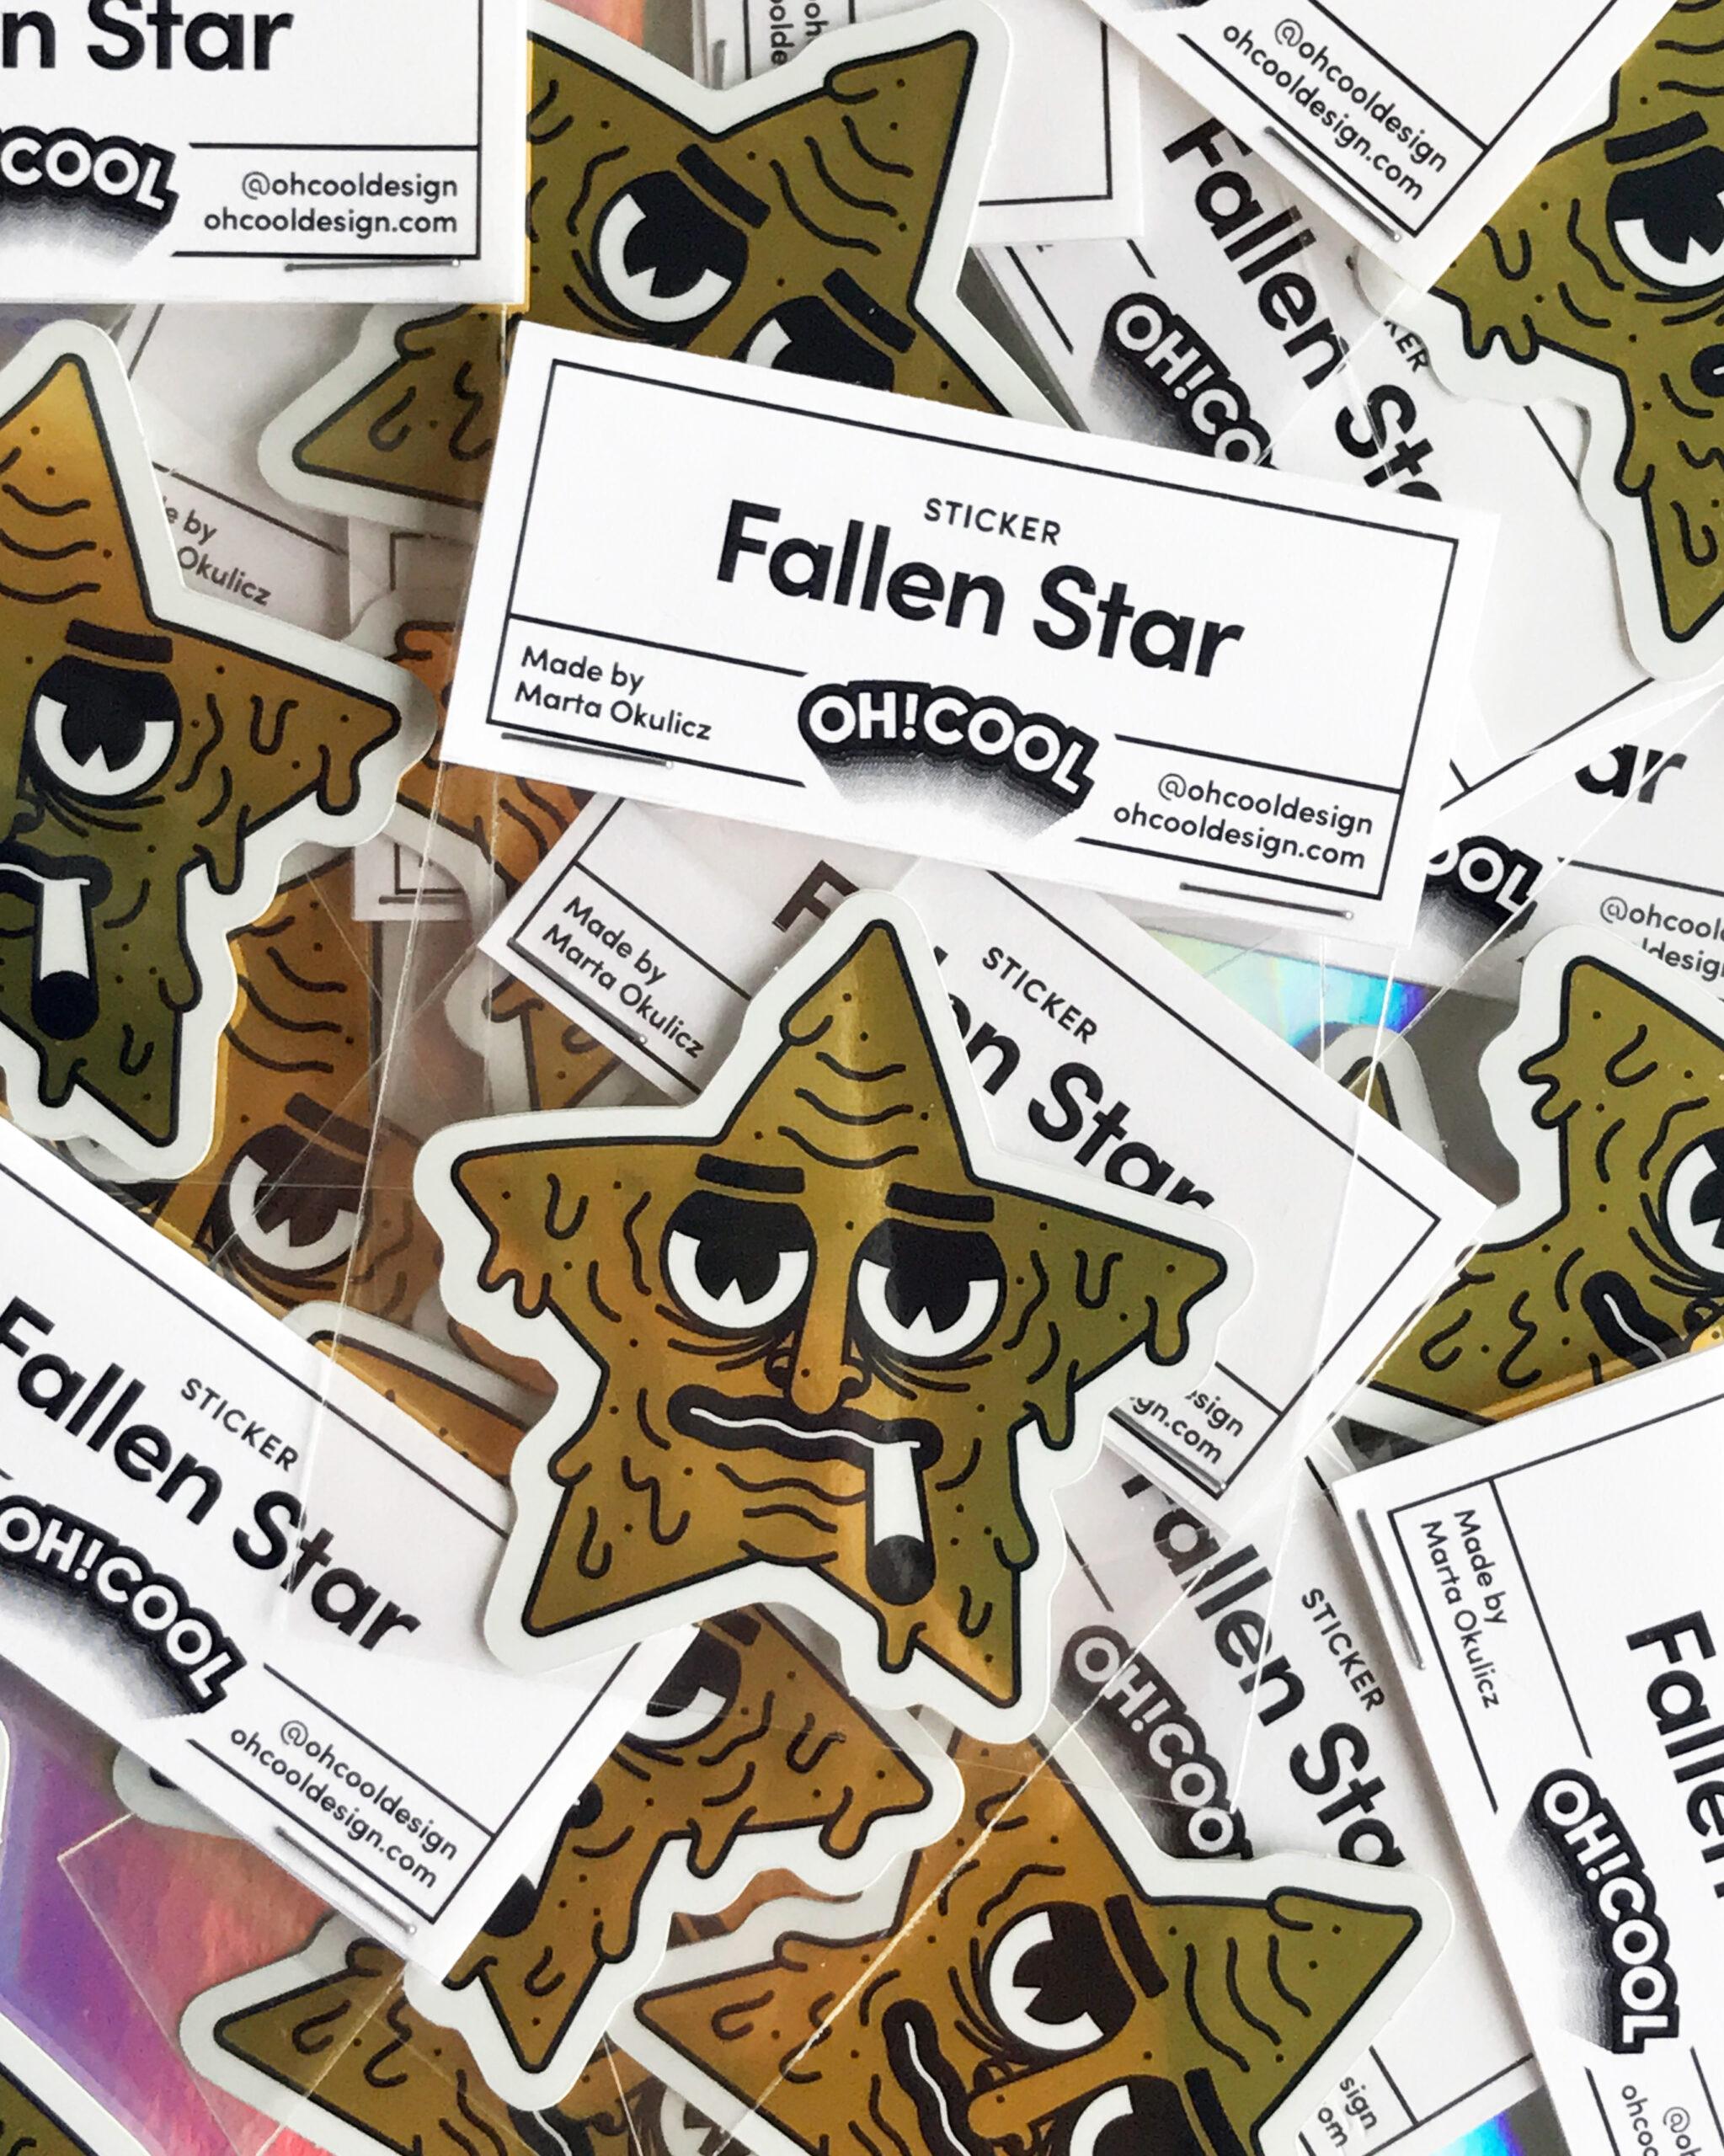 star-sticker-pic-06